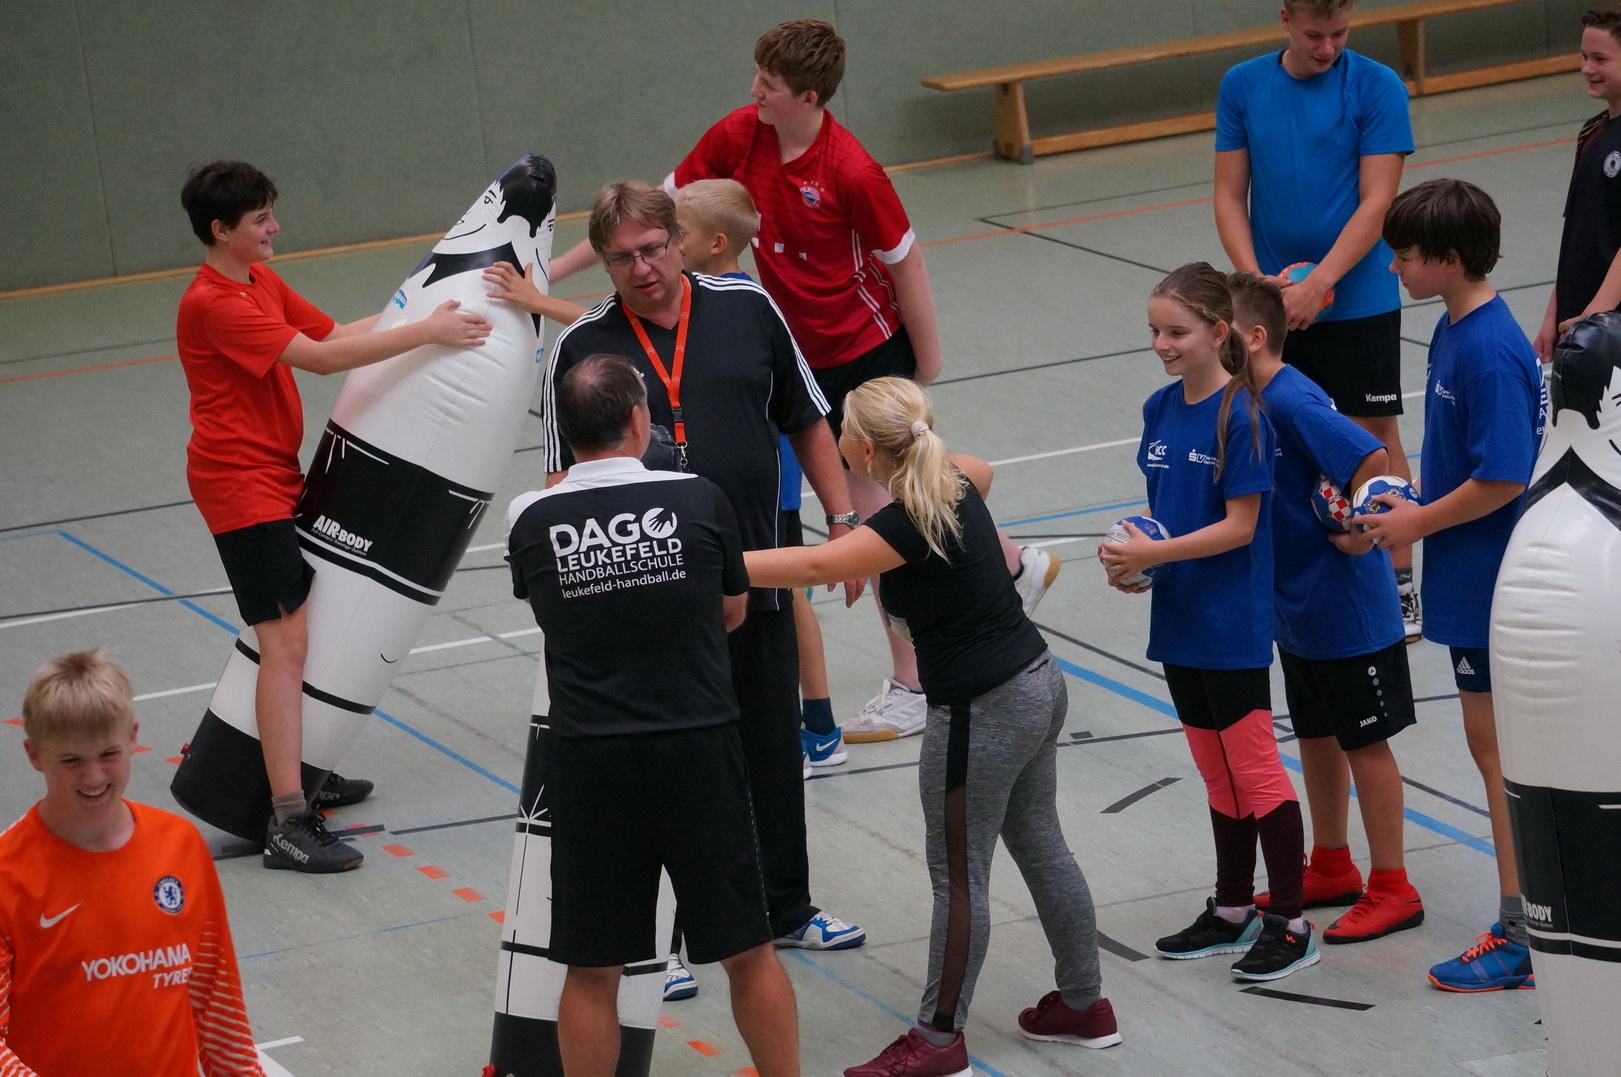 201808_Handballcamp_SDH_MG_234w